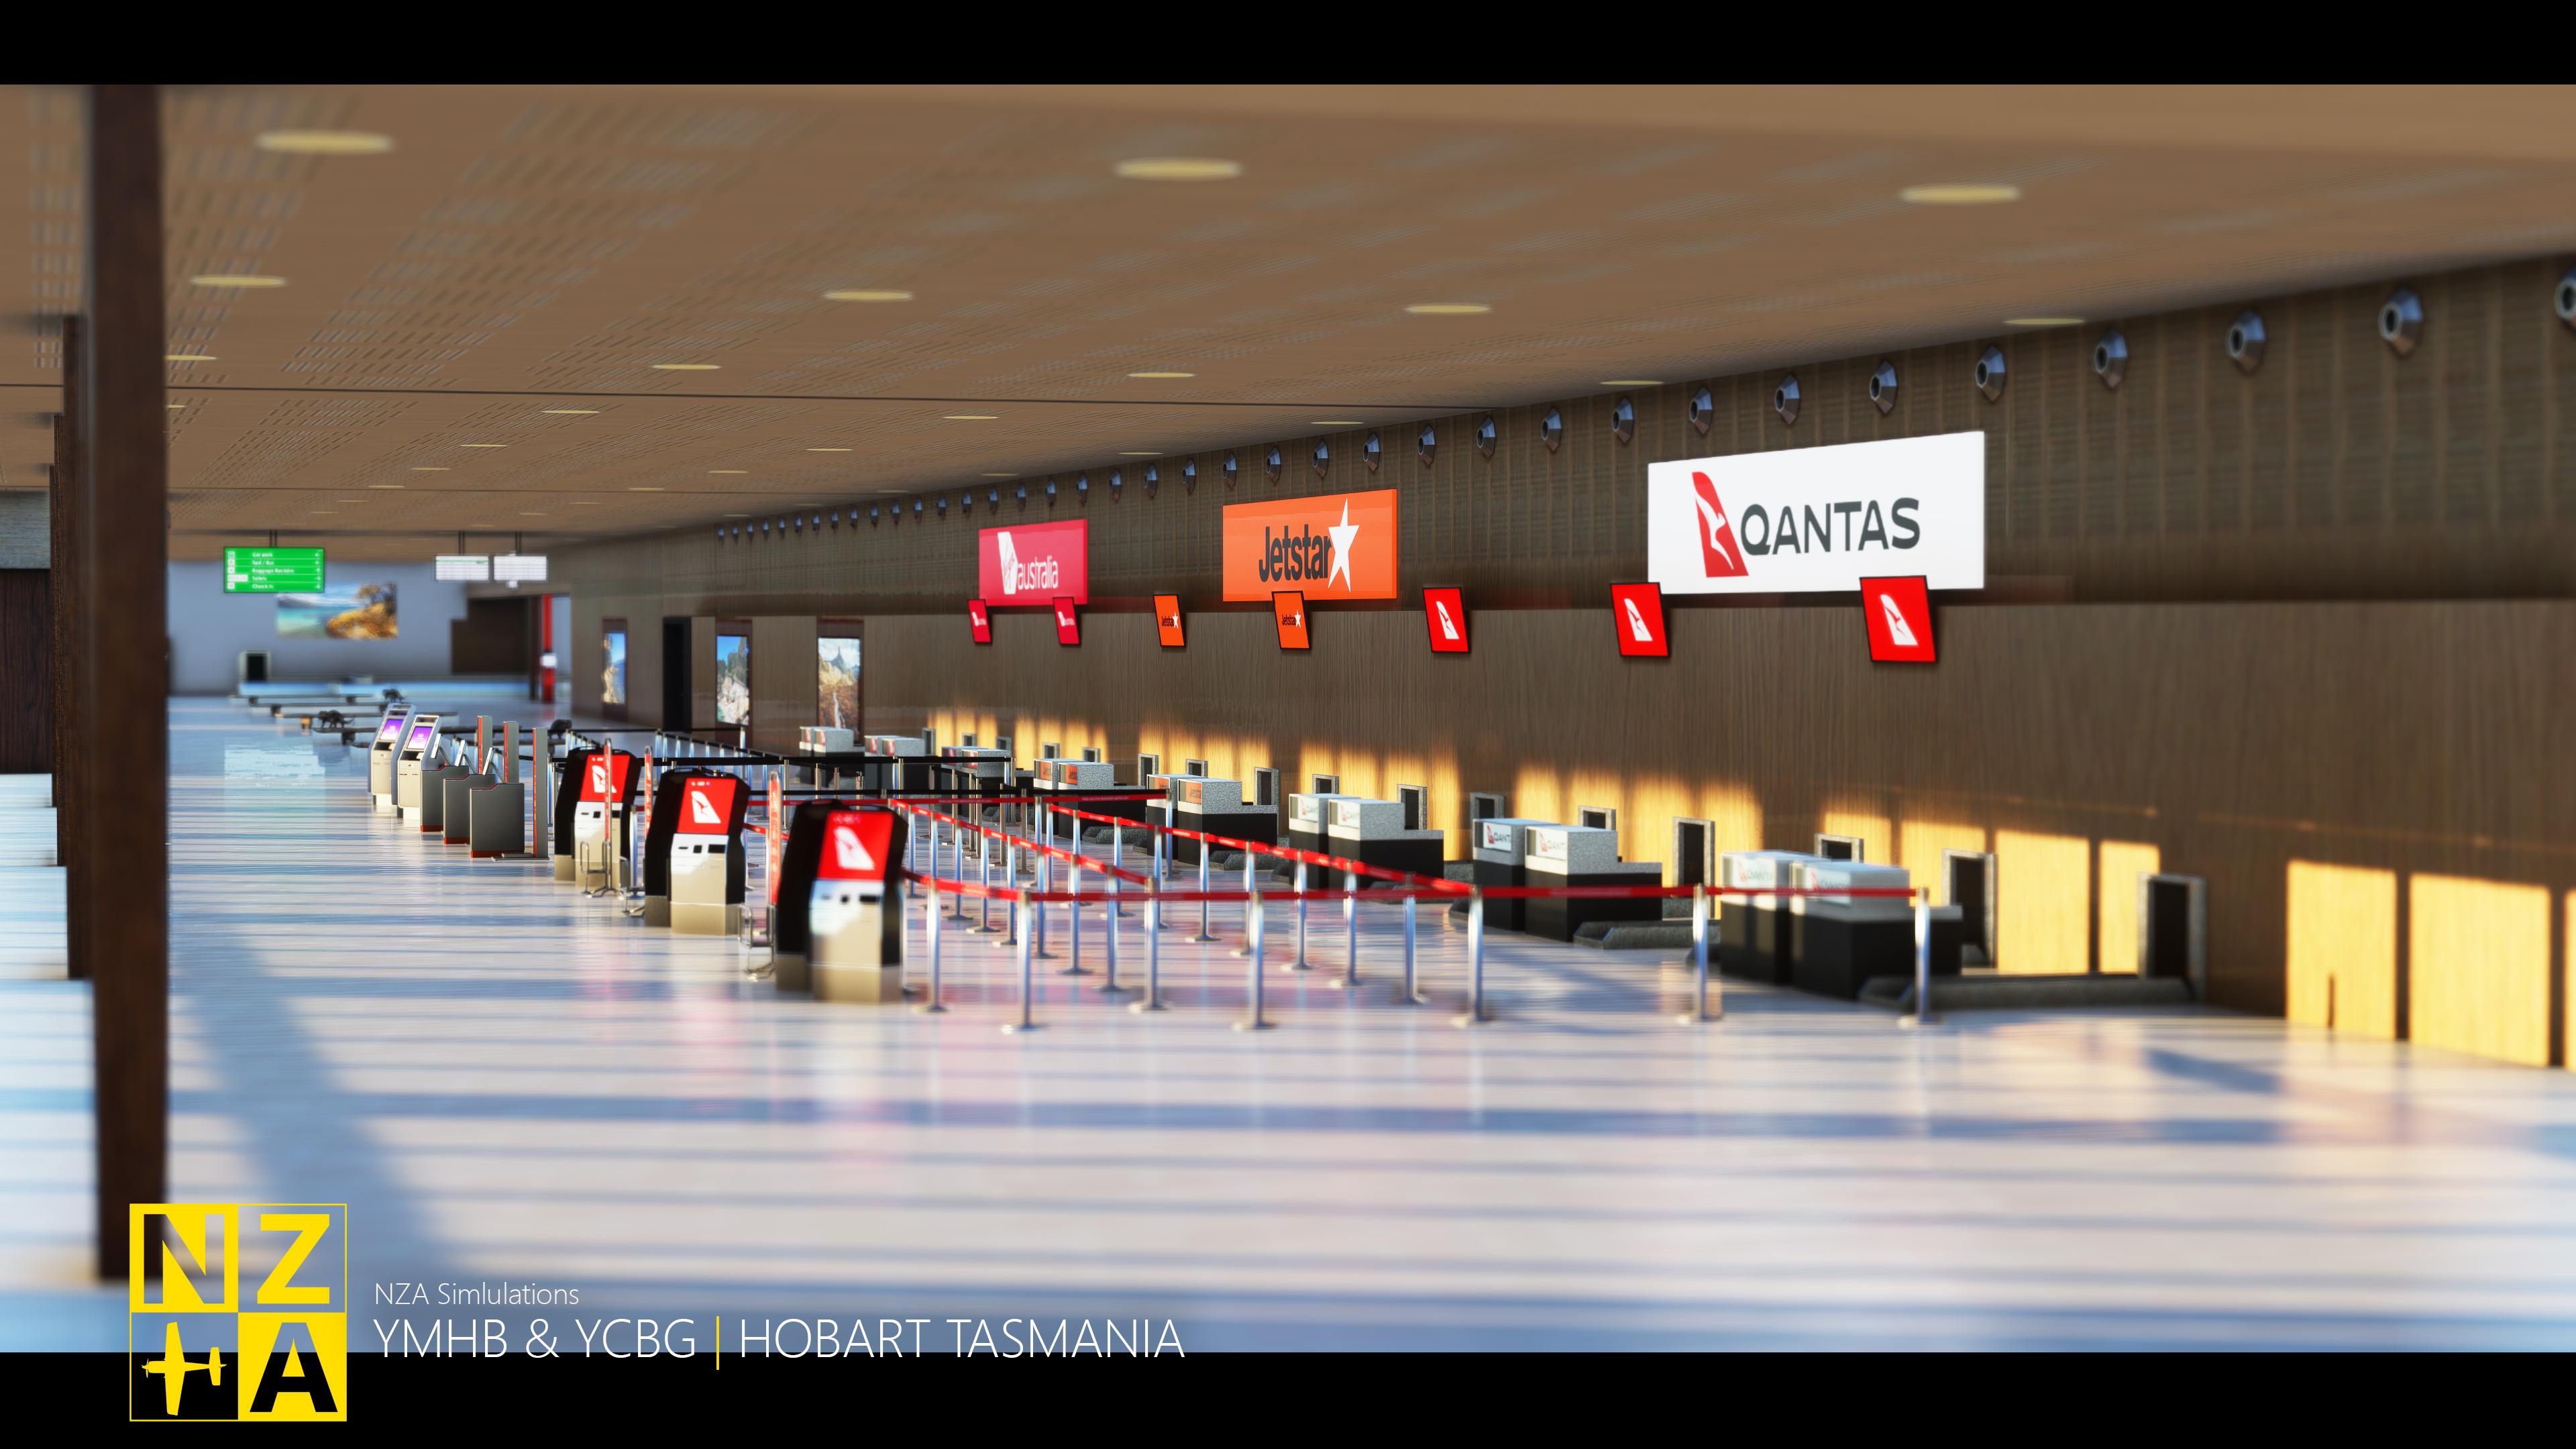 NZA Simulations - YMHB & YCBG - Terminal Check-in 1.jpg